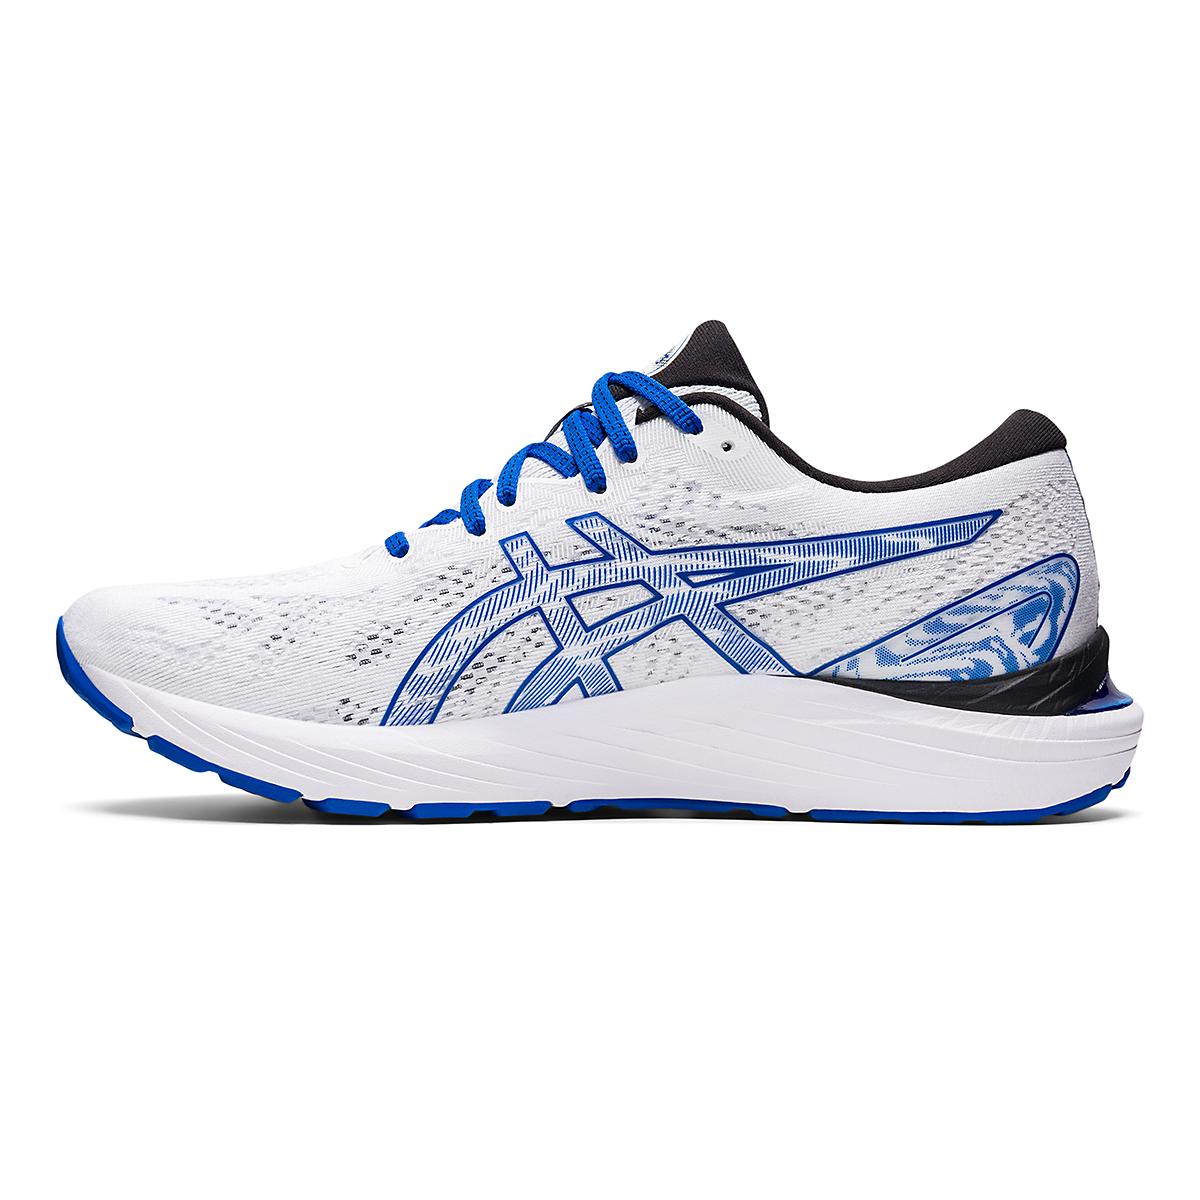 Men's Asics SMU Gel-Cumulus 23 Running Shoe - Color: White/Tuna Blue - Size: 6 - Width: Regular, White/Tuna Blue, large, image 2